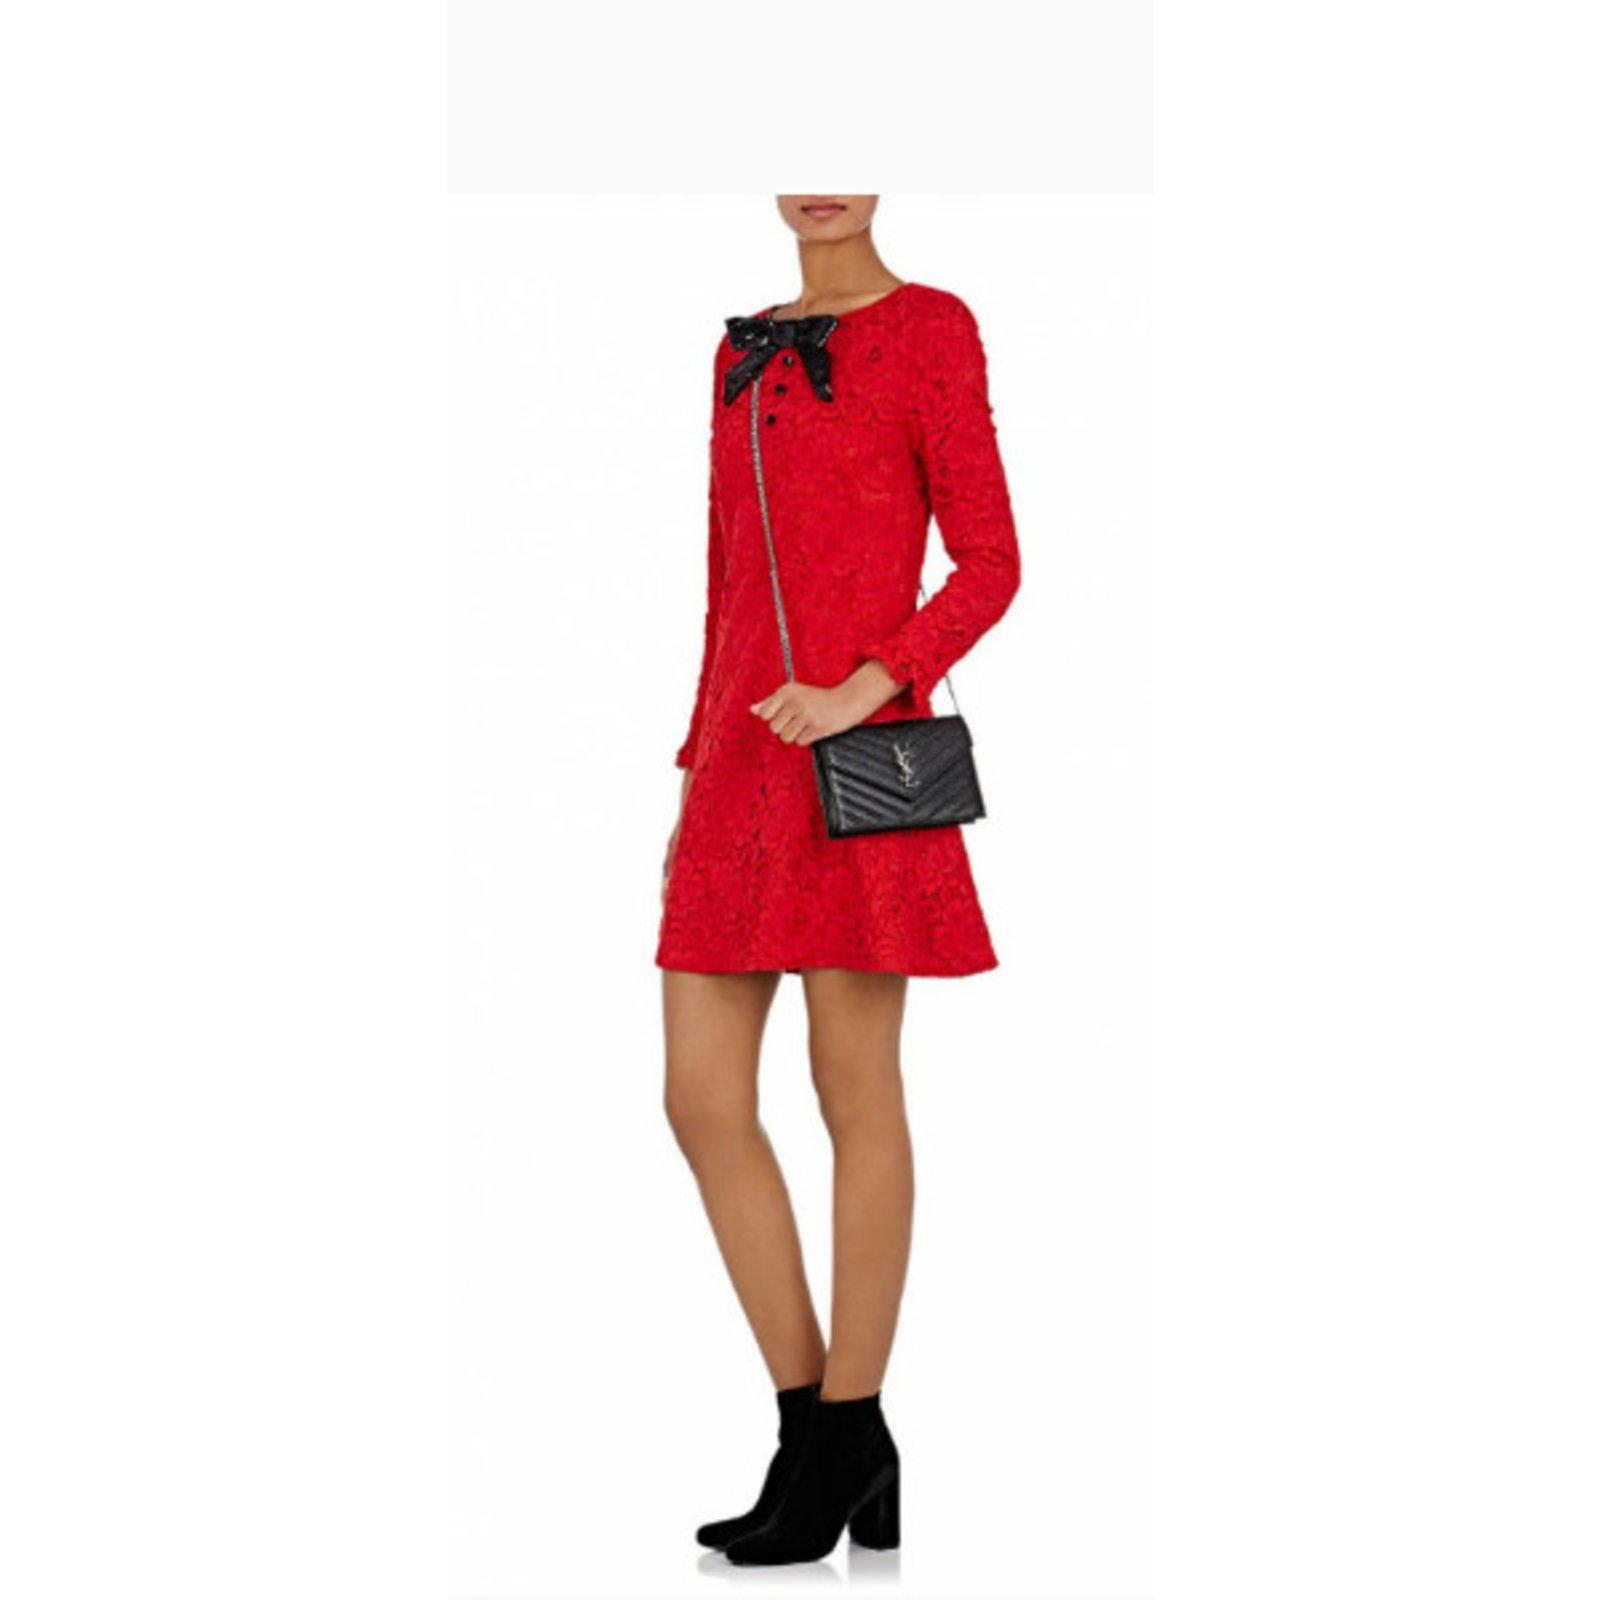 6da0705ddfe Yves Saint Laurent Saint Laurent Classic Monogram Chain Wallet Ba Handbags  Leather White ref.35427 - Joli Closet